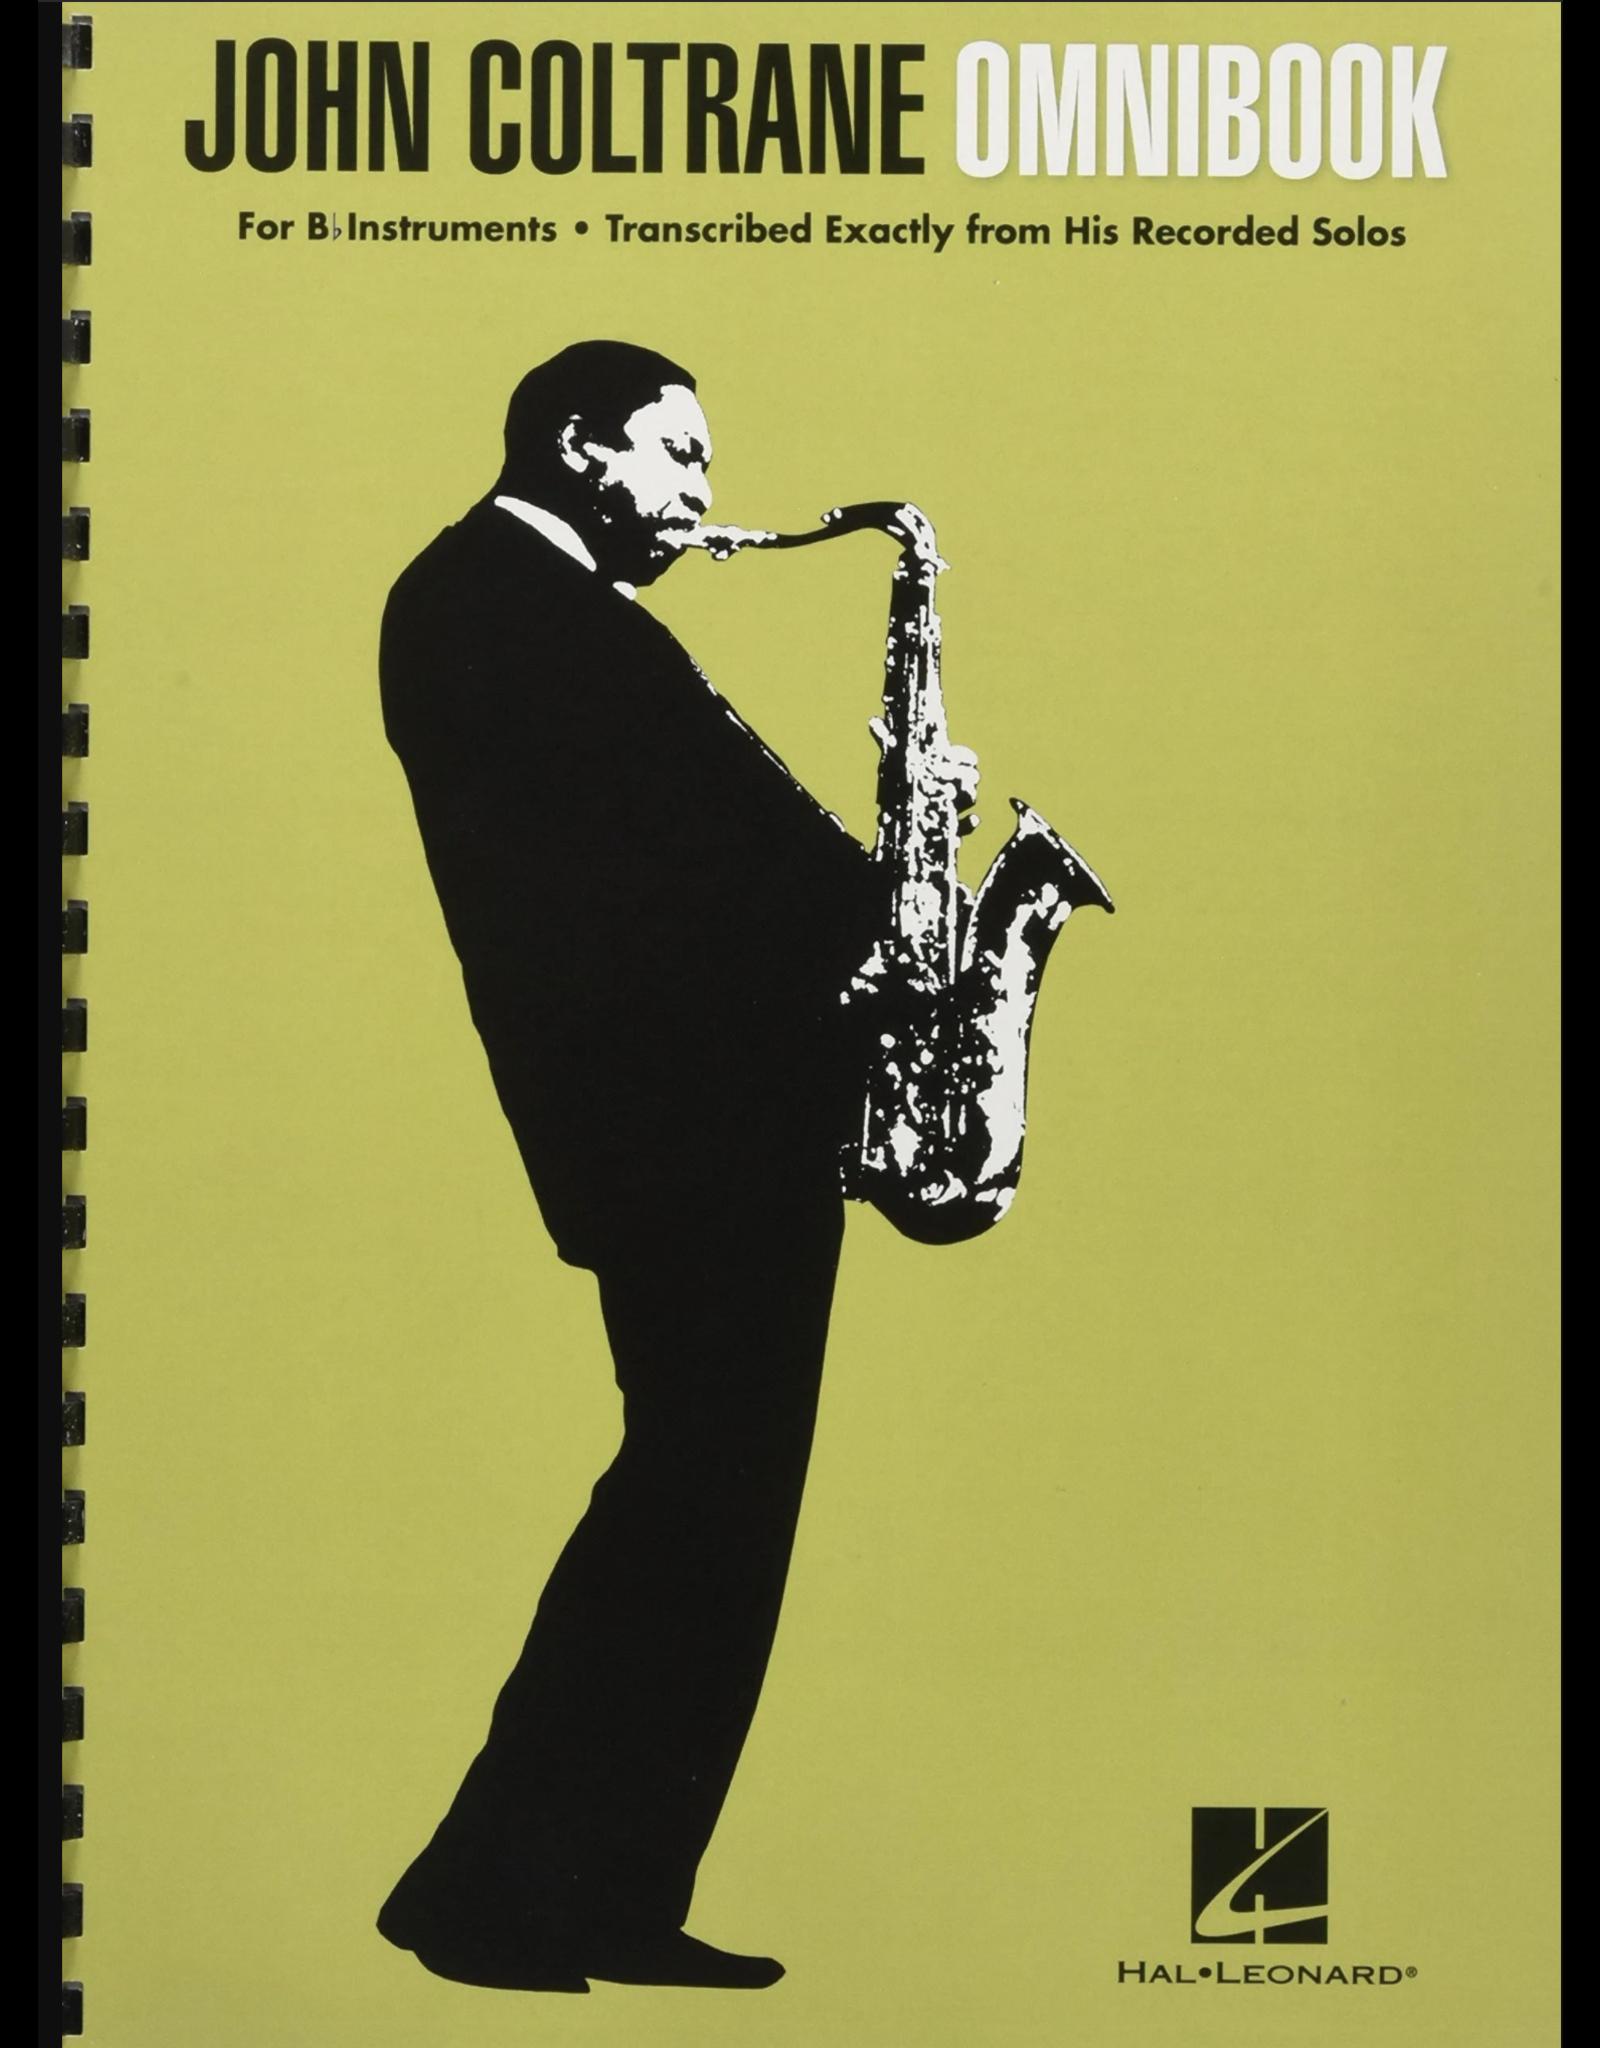 Hal Leonard John Coltrane - Omnibook For B-flat Instruments Jazz Transcriptions